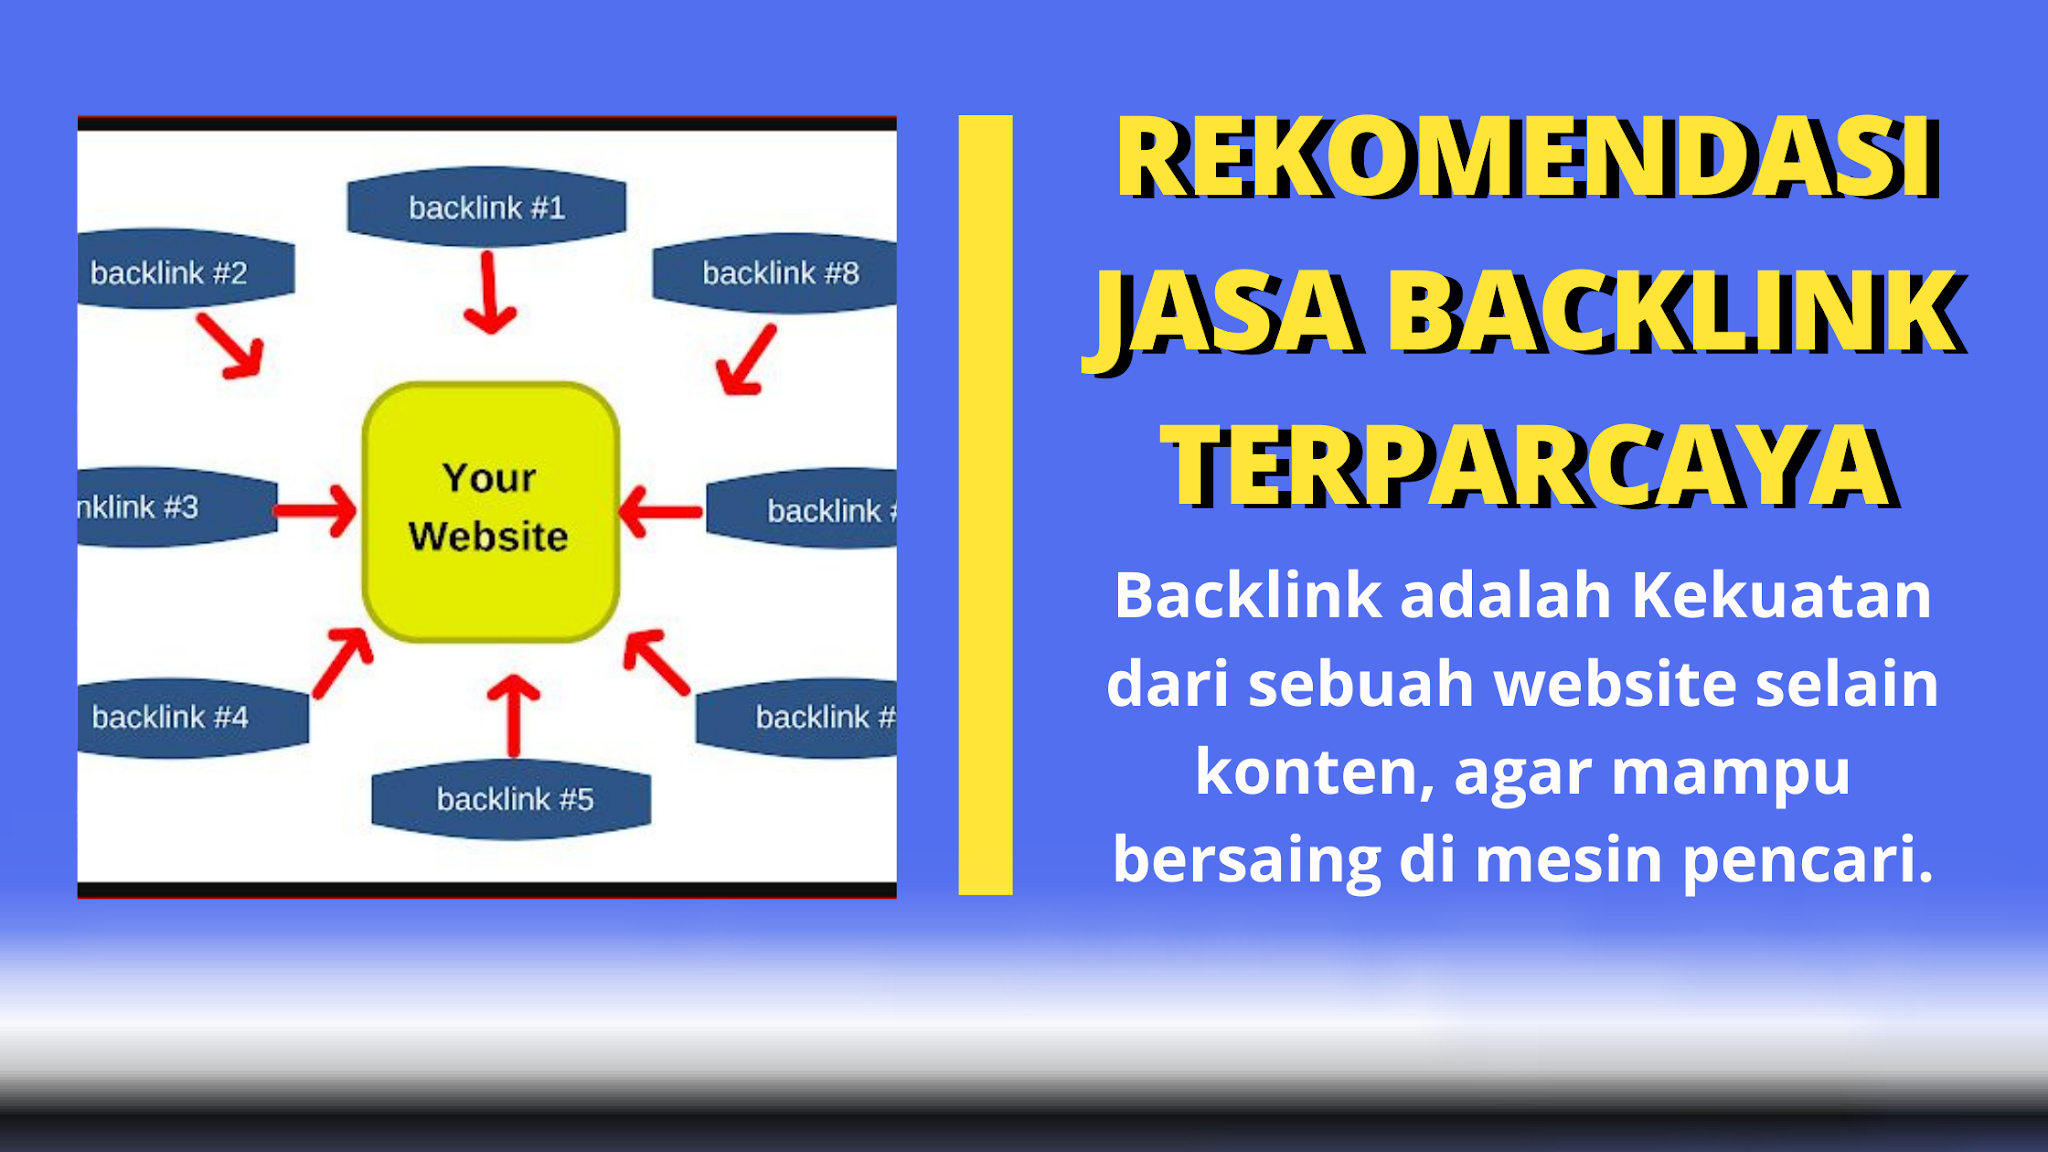 Jasa Backlink Murah Terpercaya